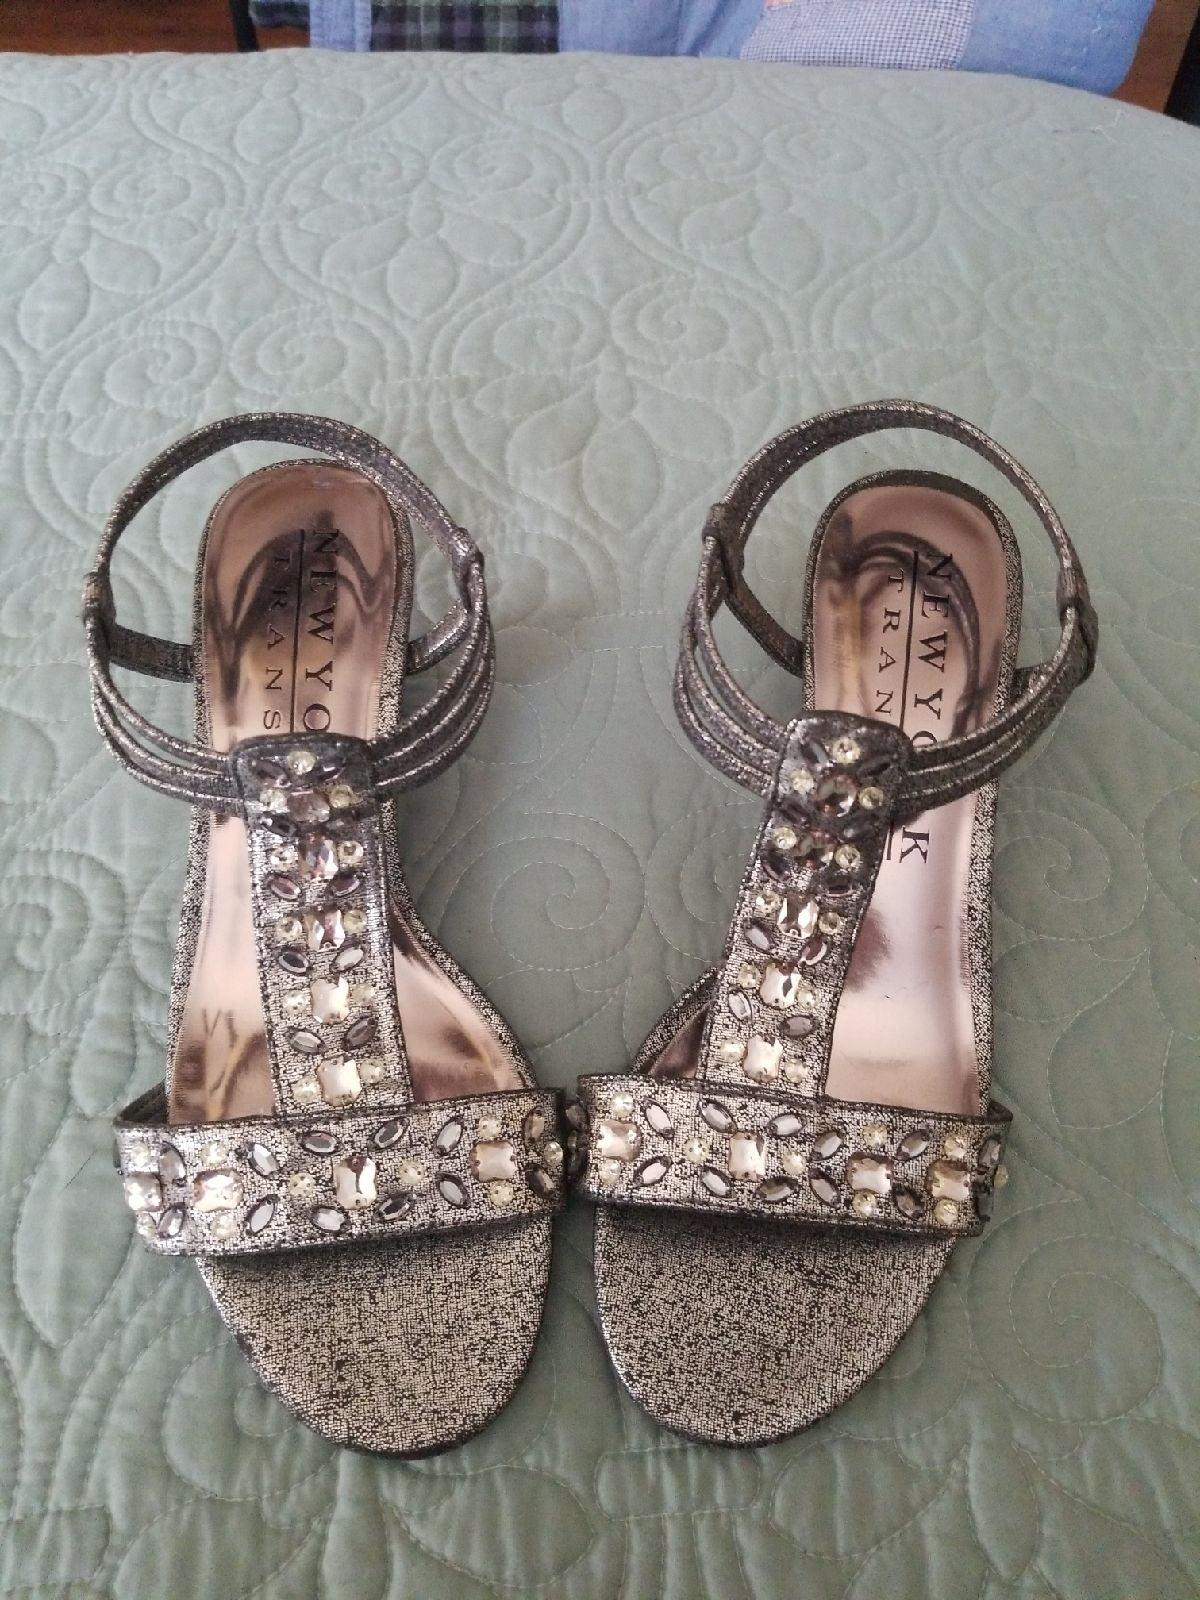 Sandles size 6 1/2